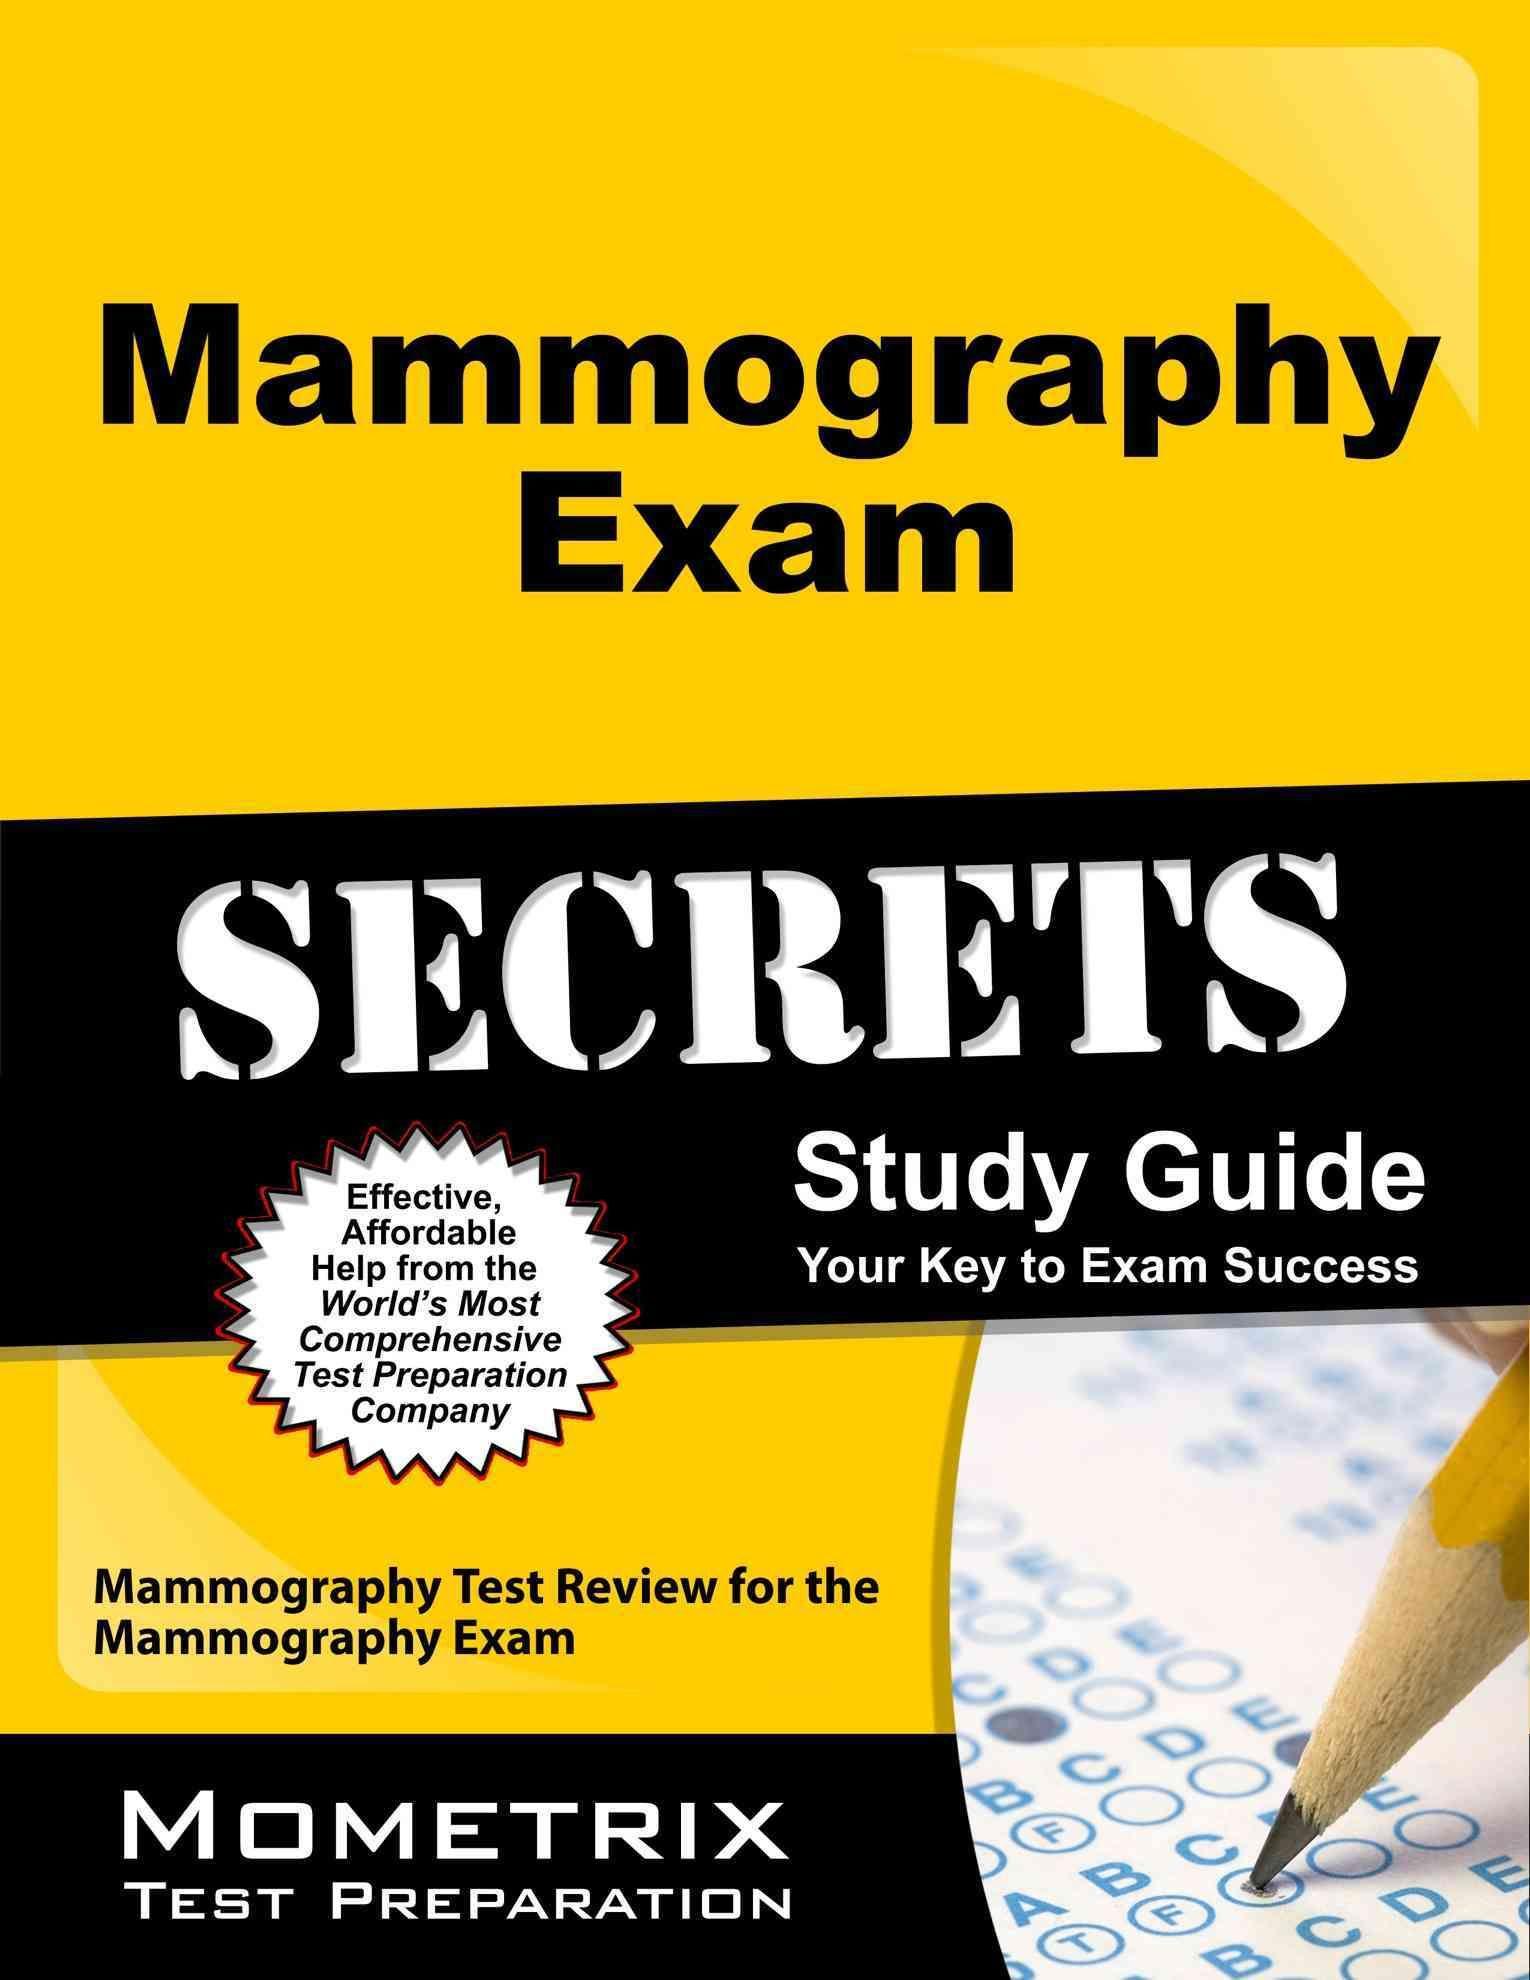 Mammography exam secrets study guide mammography test review for mammography exam secrets study guide mammography test review for the mammography exam xflitez Gallery